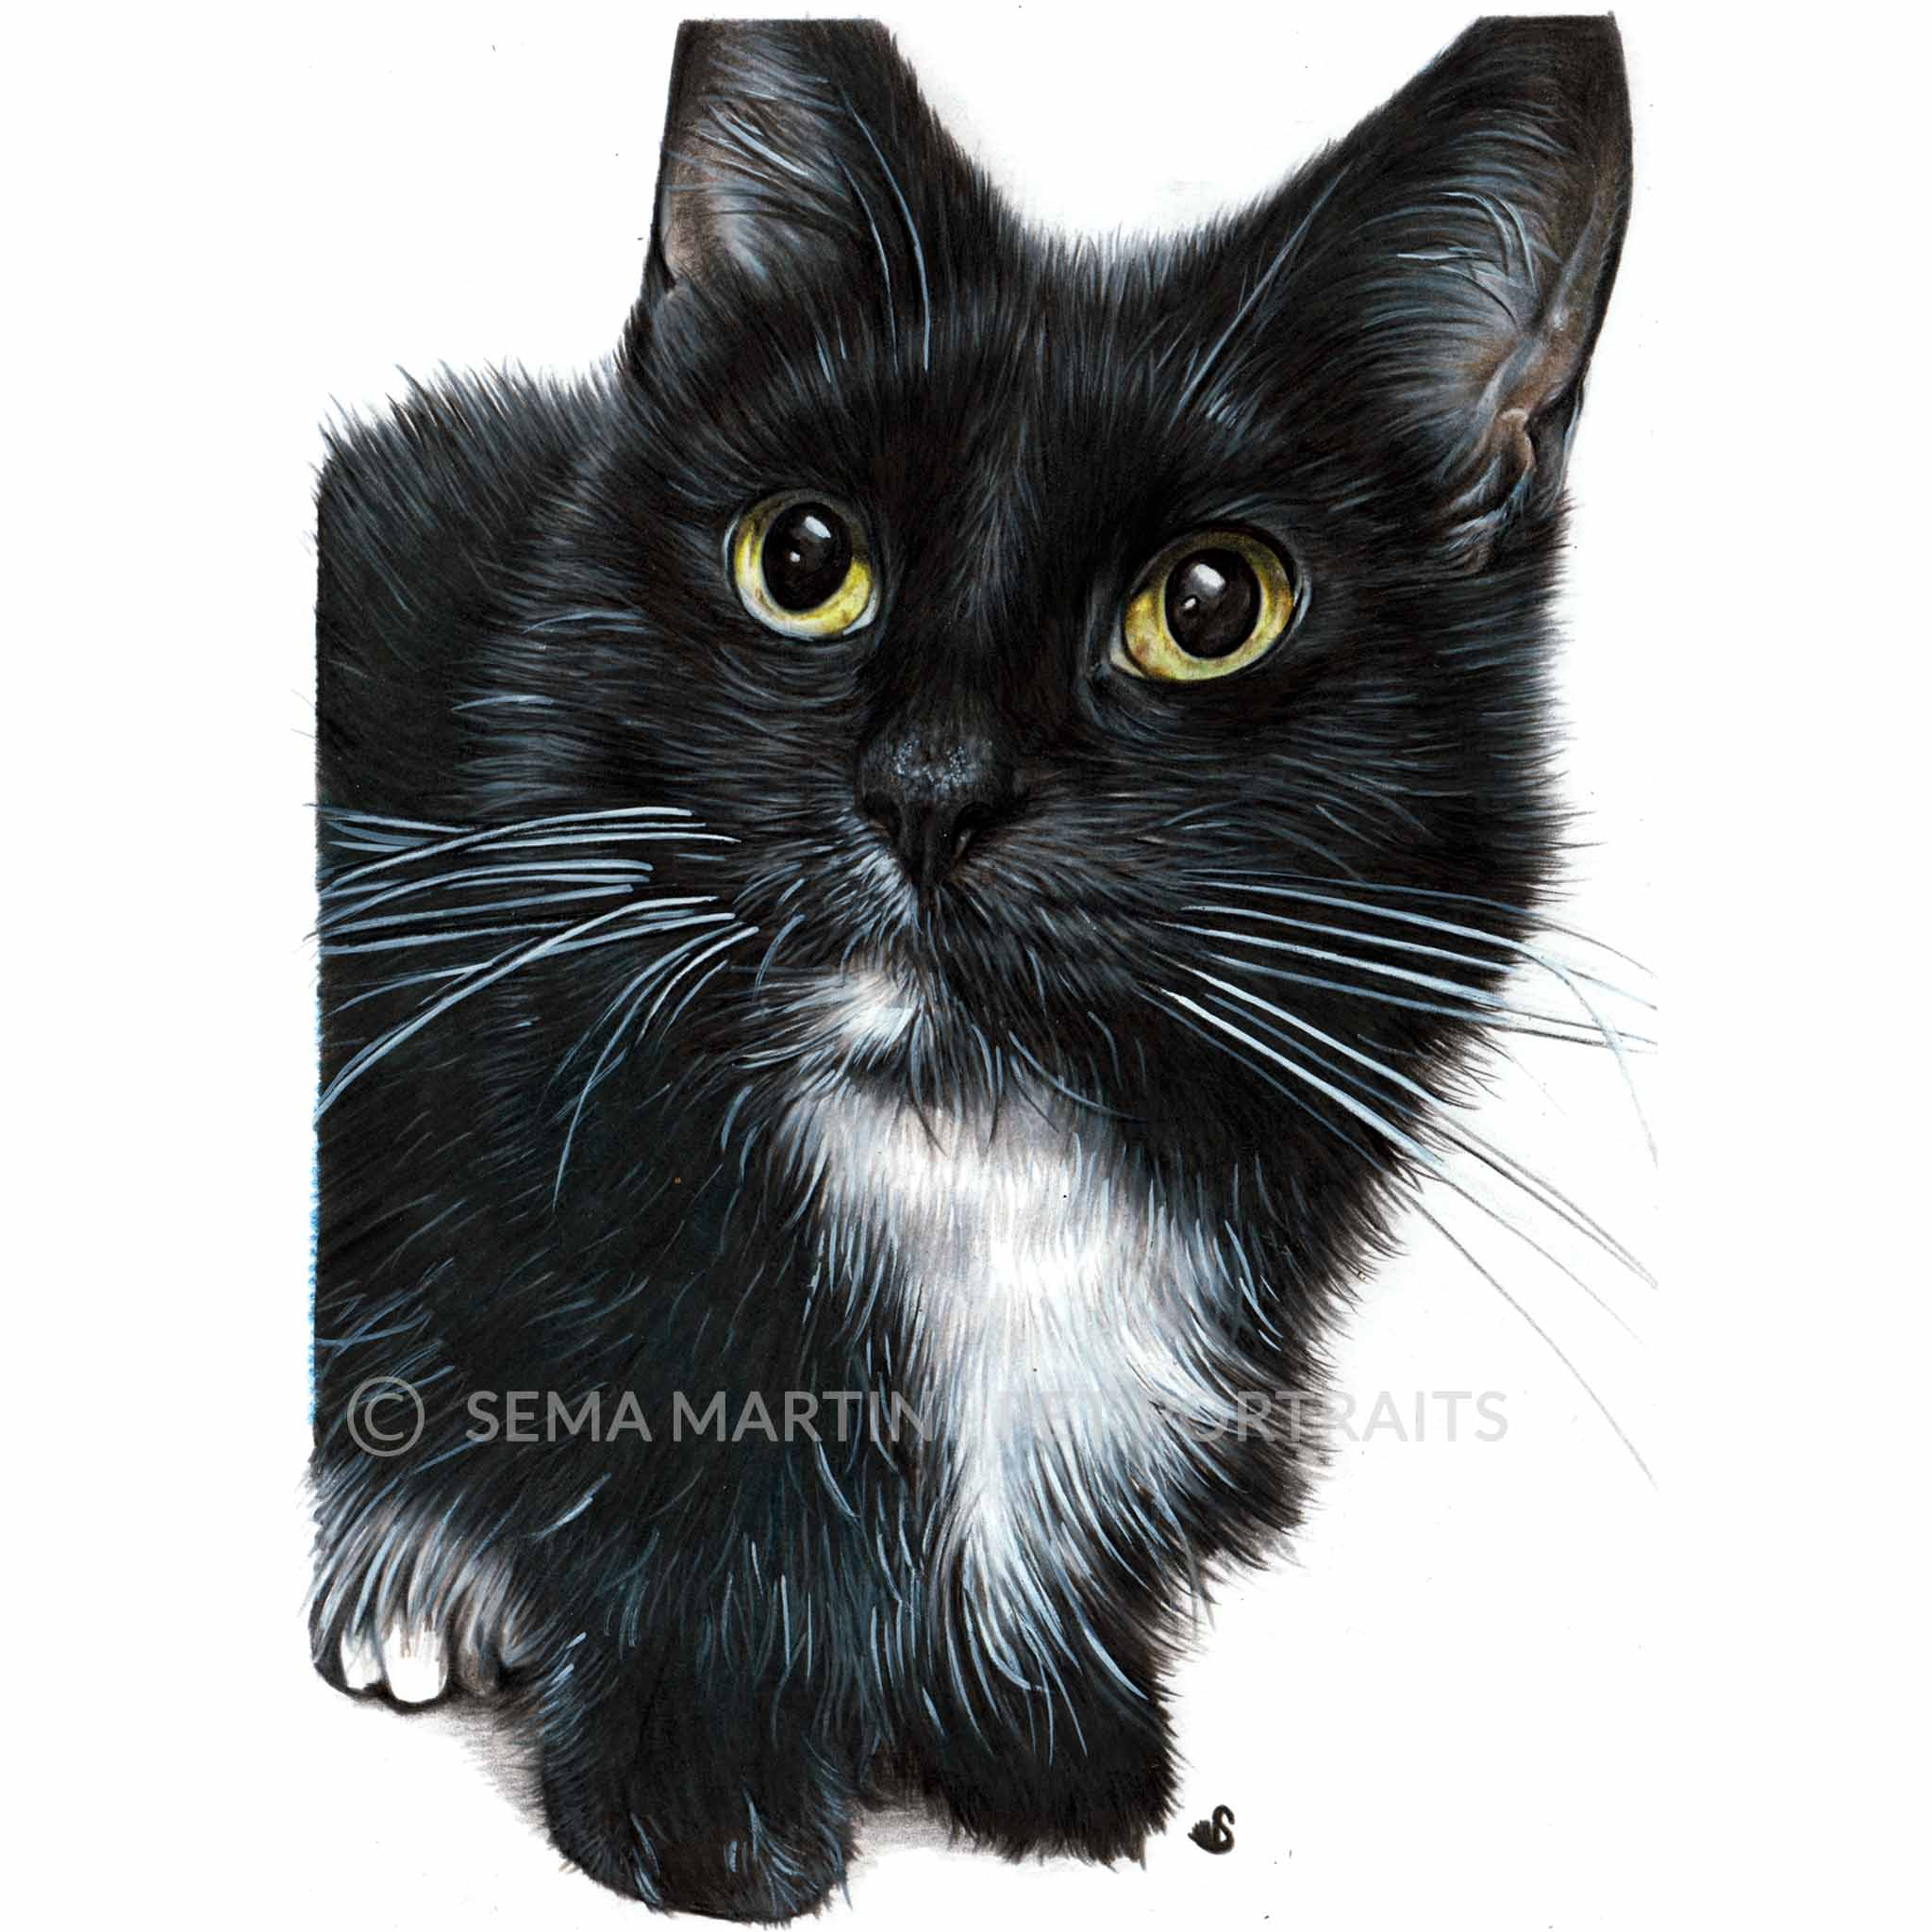 'Charlie' - USA, 5.8 x 8.3 inches, 2018, Colour Pencil Cat Portrait by Sema Martin